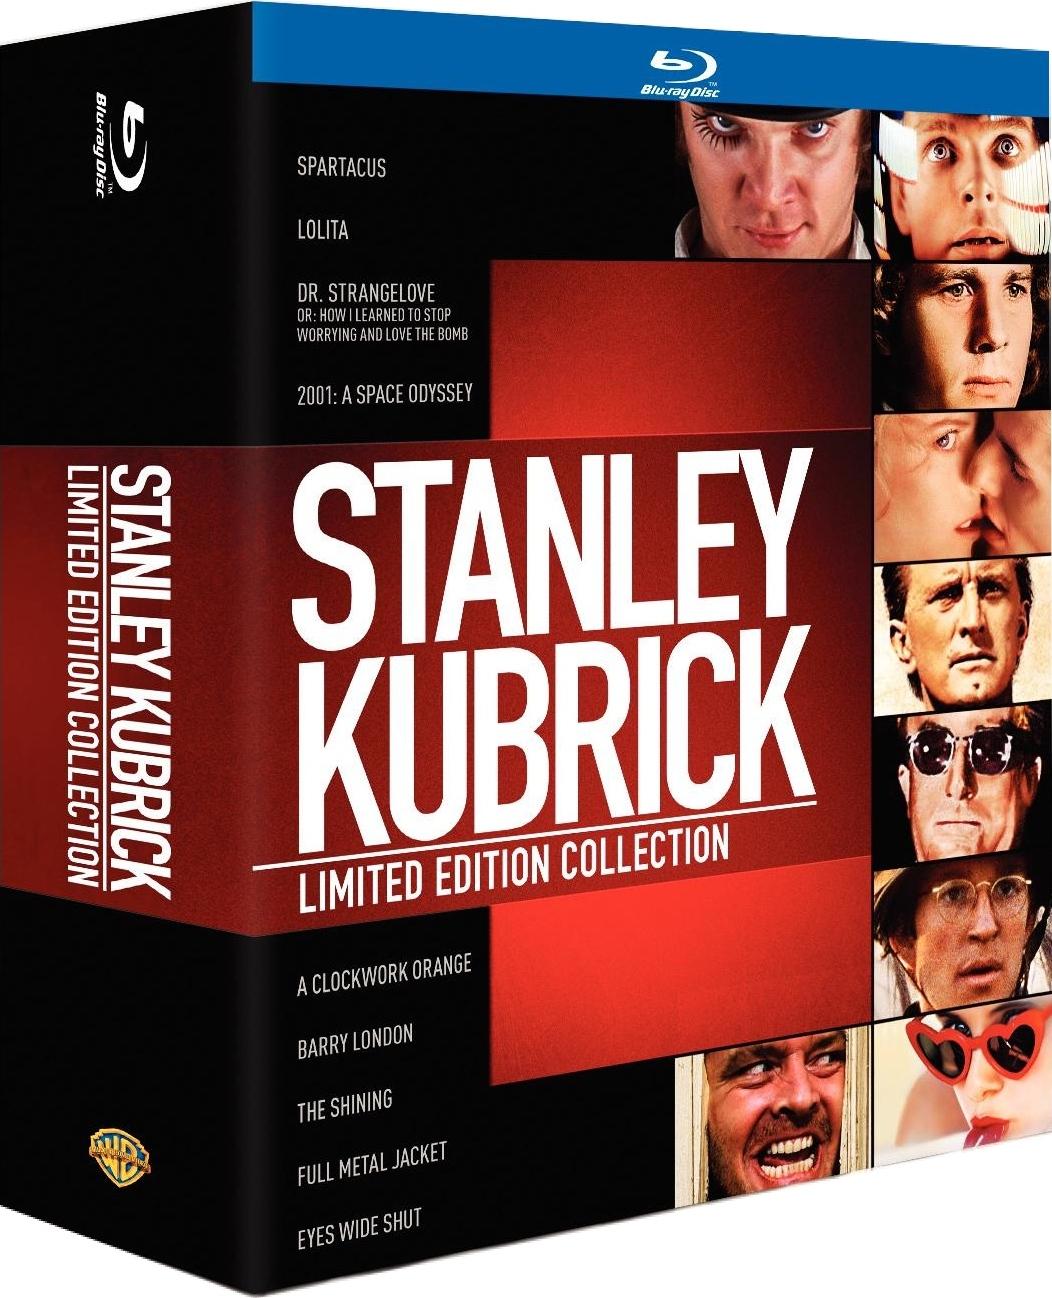 stanley kubrick essay 91 121 113 106 stanley kubrick essay